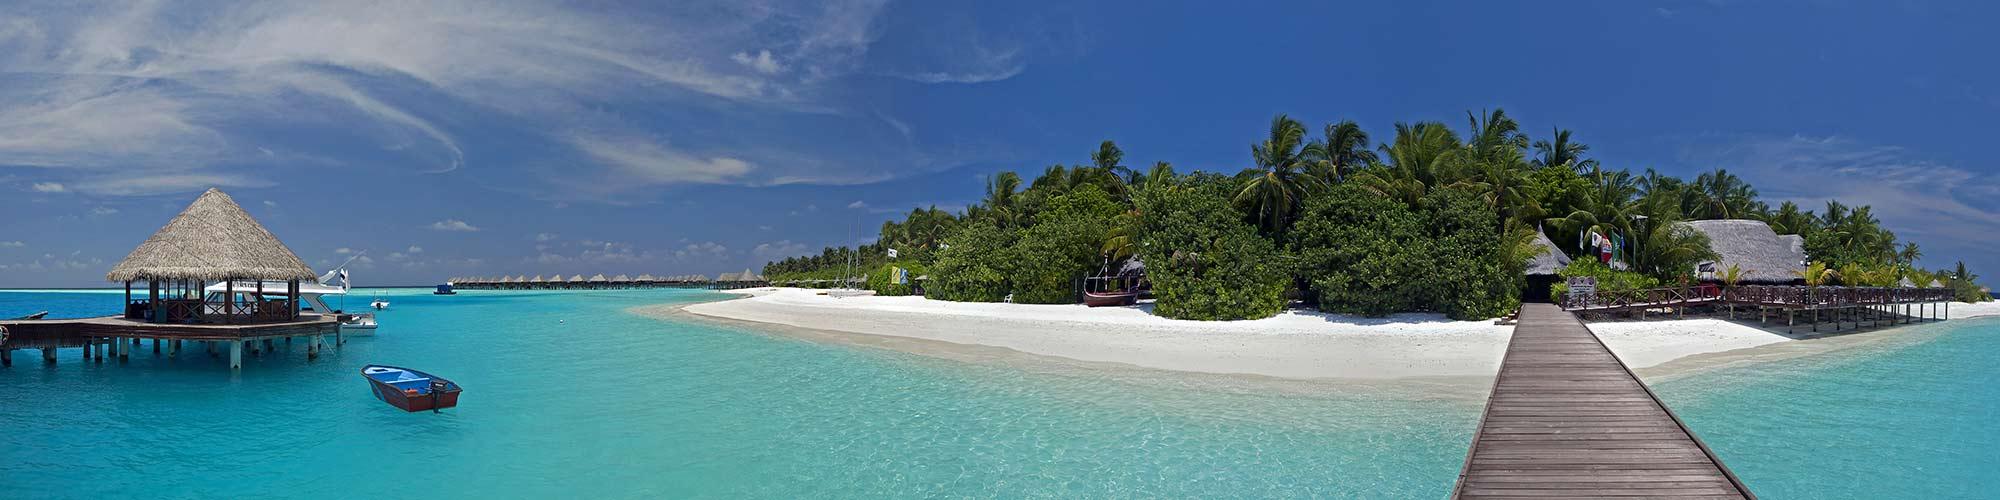 maldives-banner-5.jpg